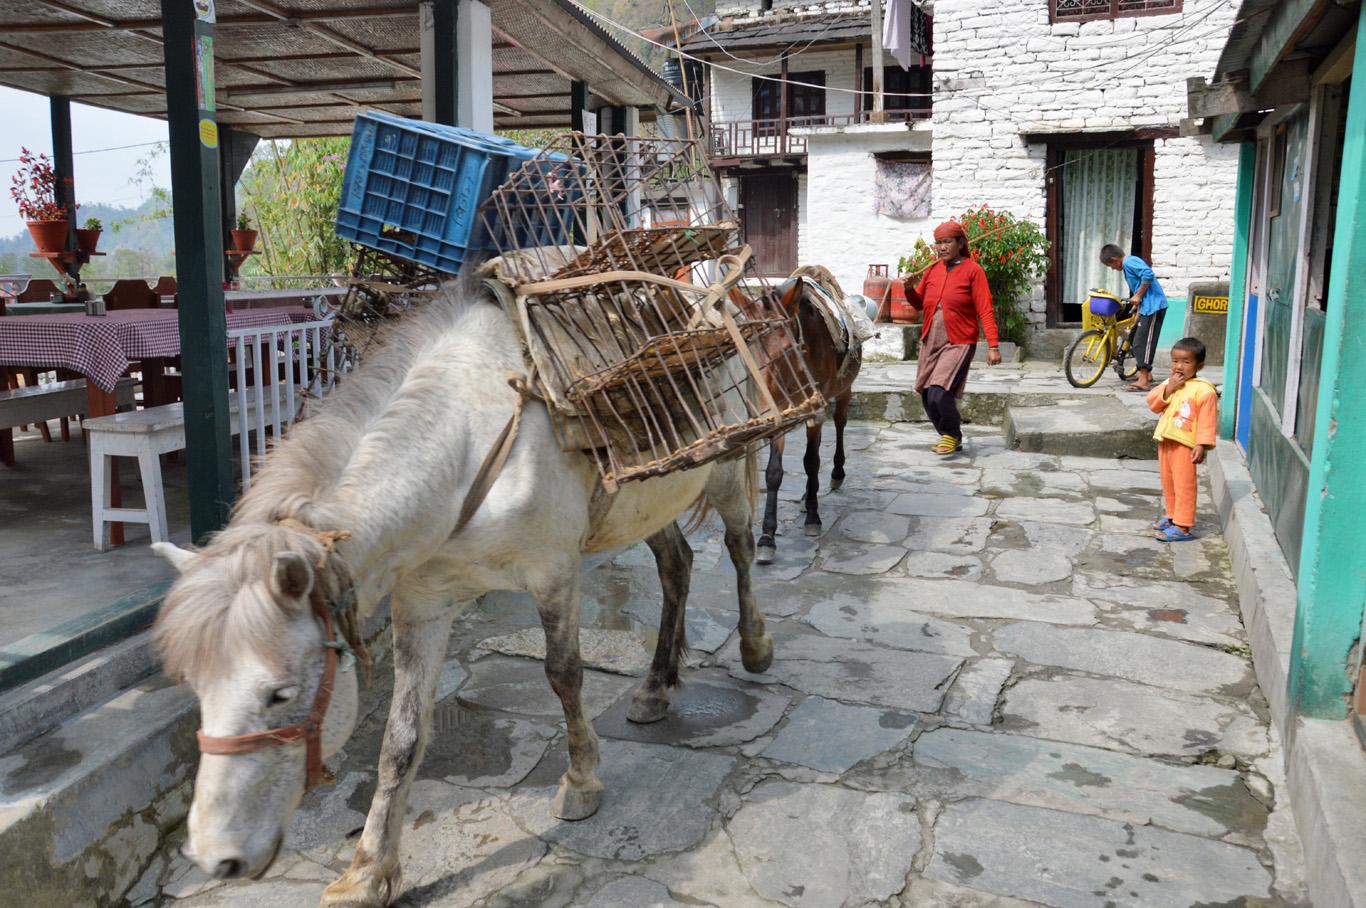 Donkeys used for transporting goods